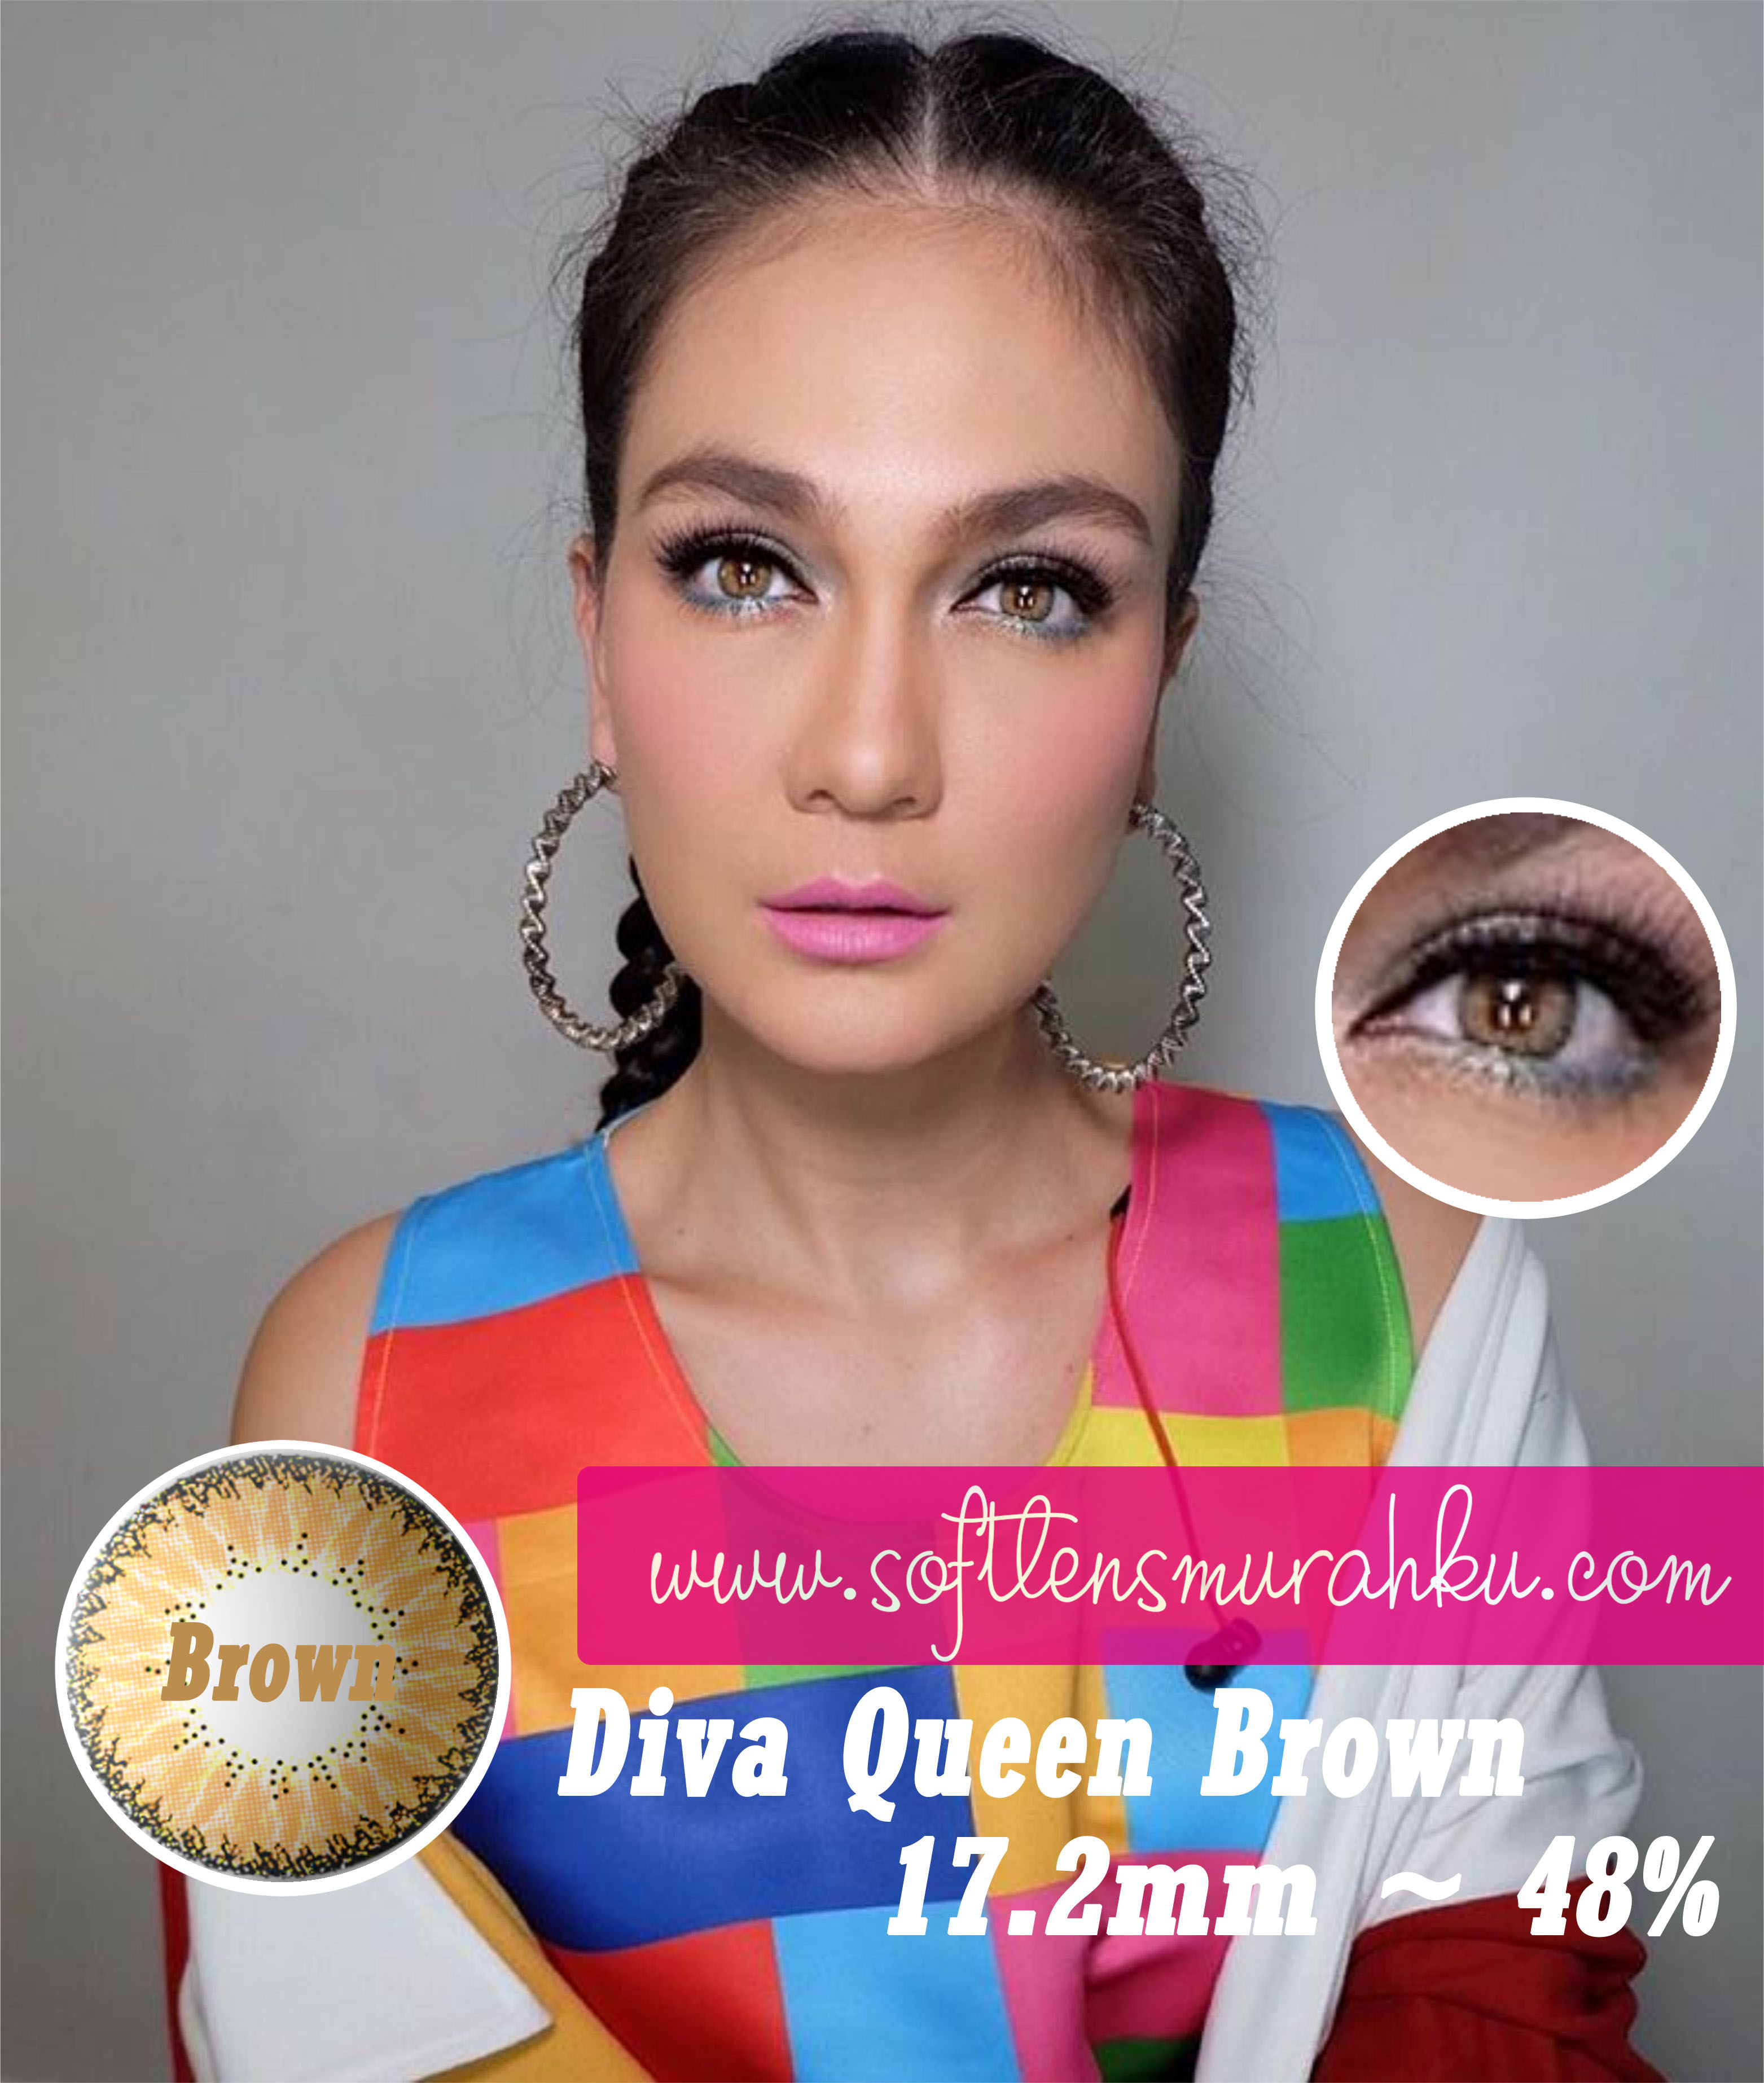 Jual Softlens Diva Queen Eos Free Ongkir Softlensmurahku X2 Soflens 142mm